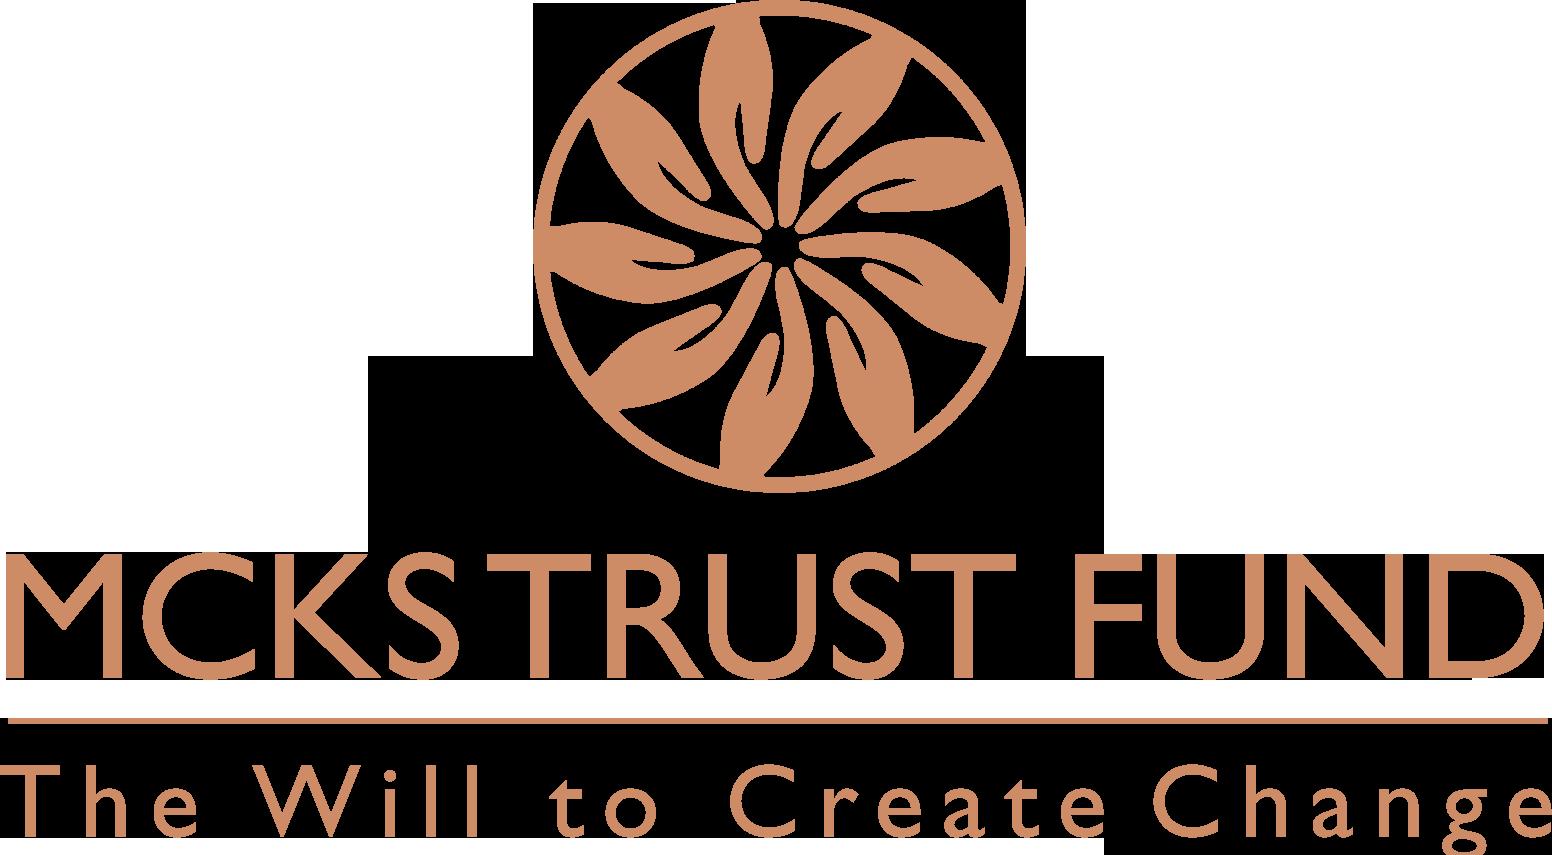 MCKS Trust Fund